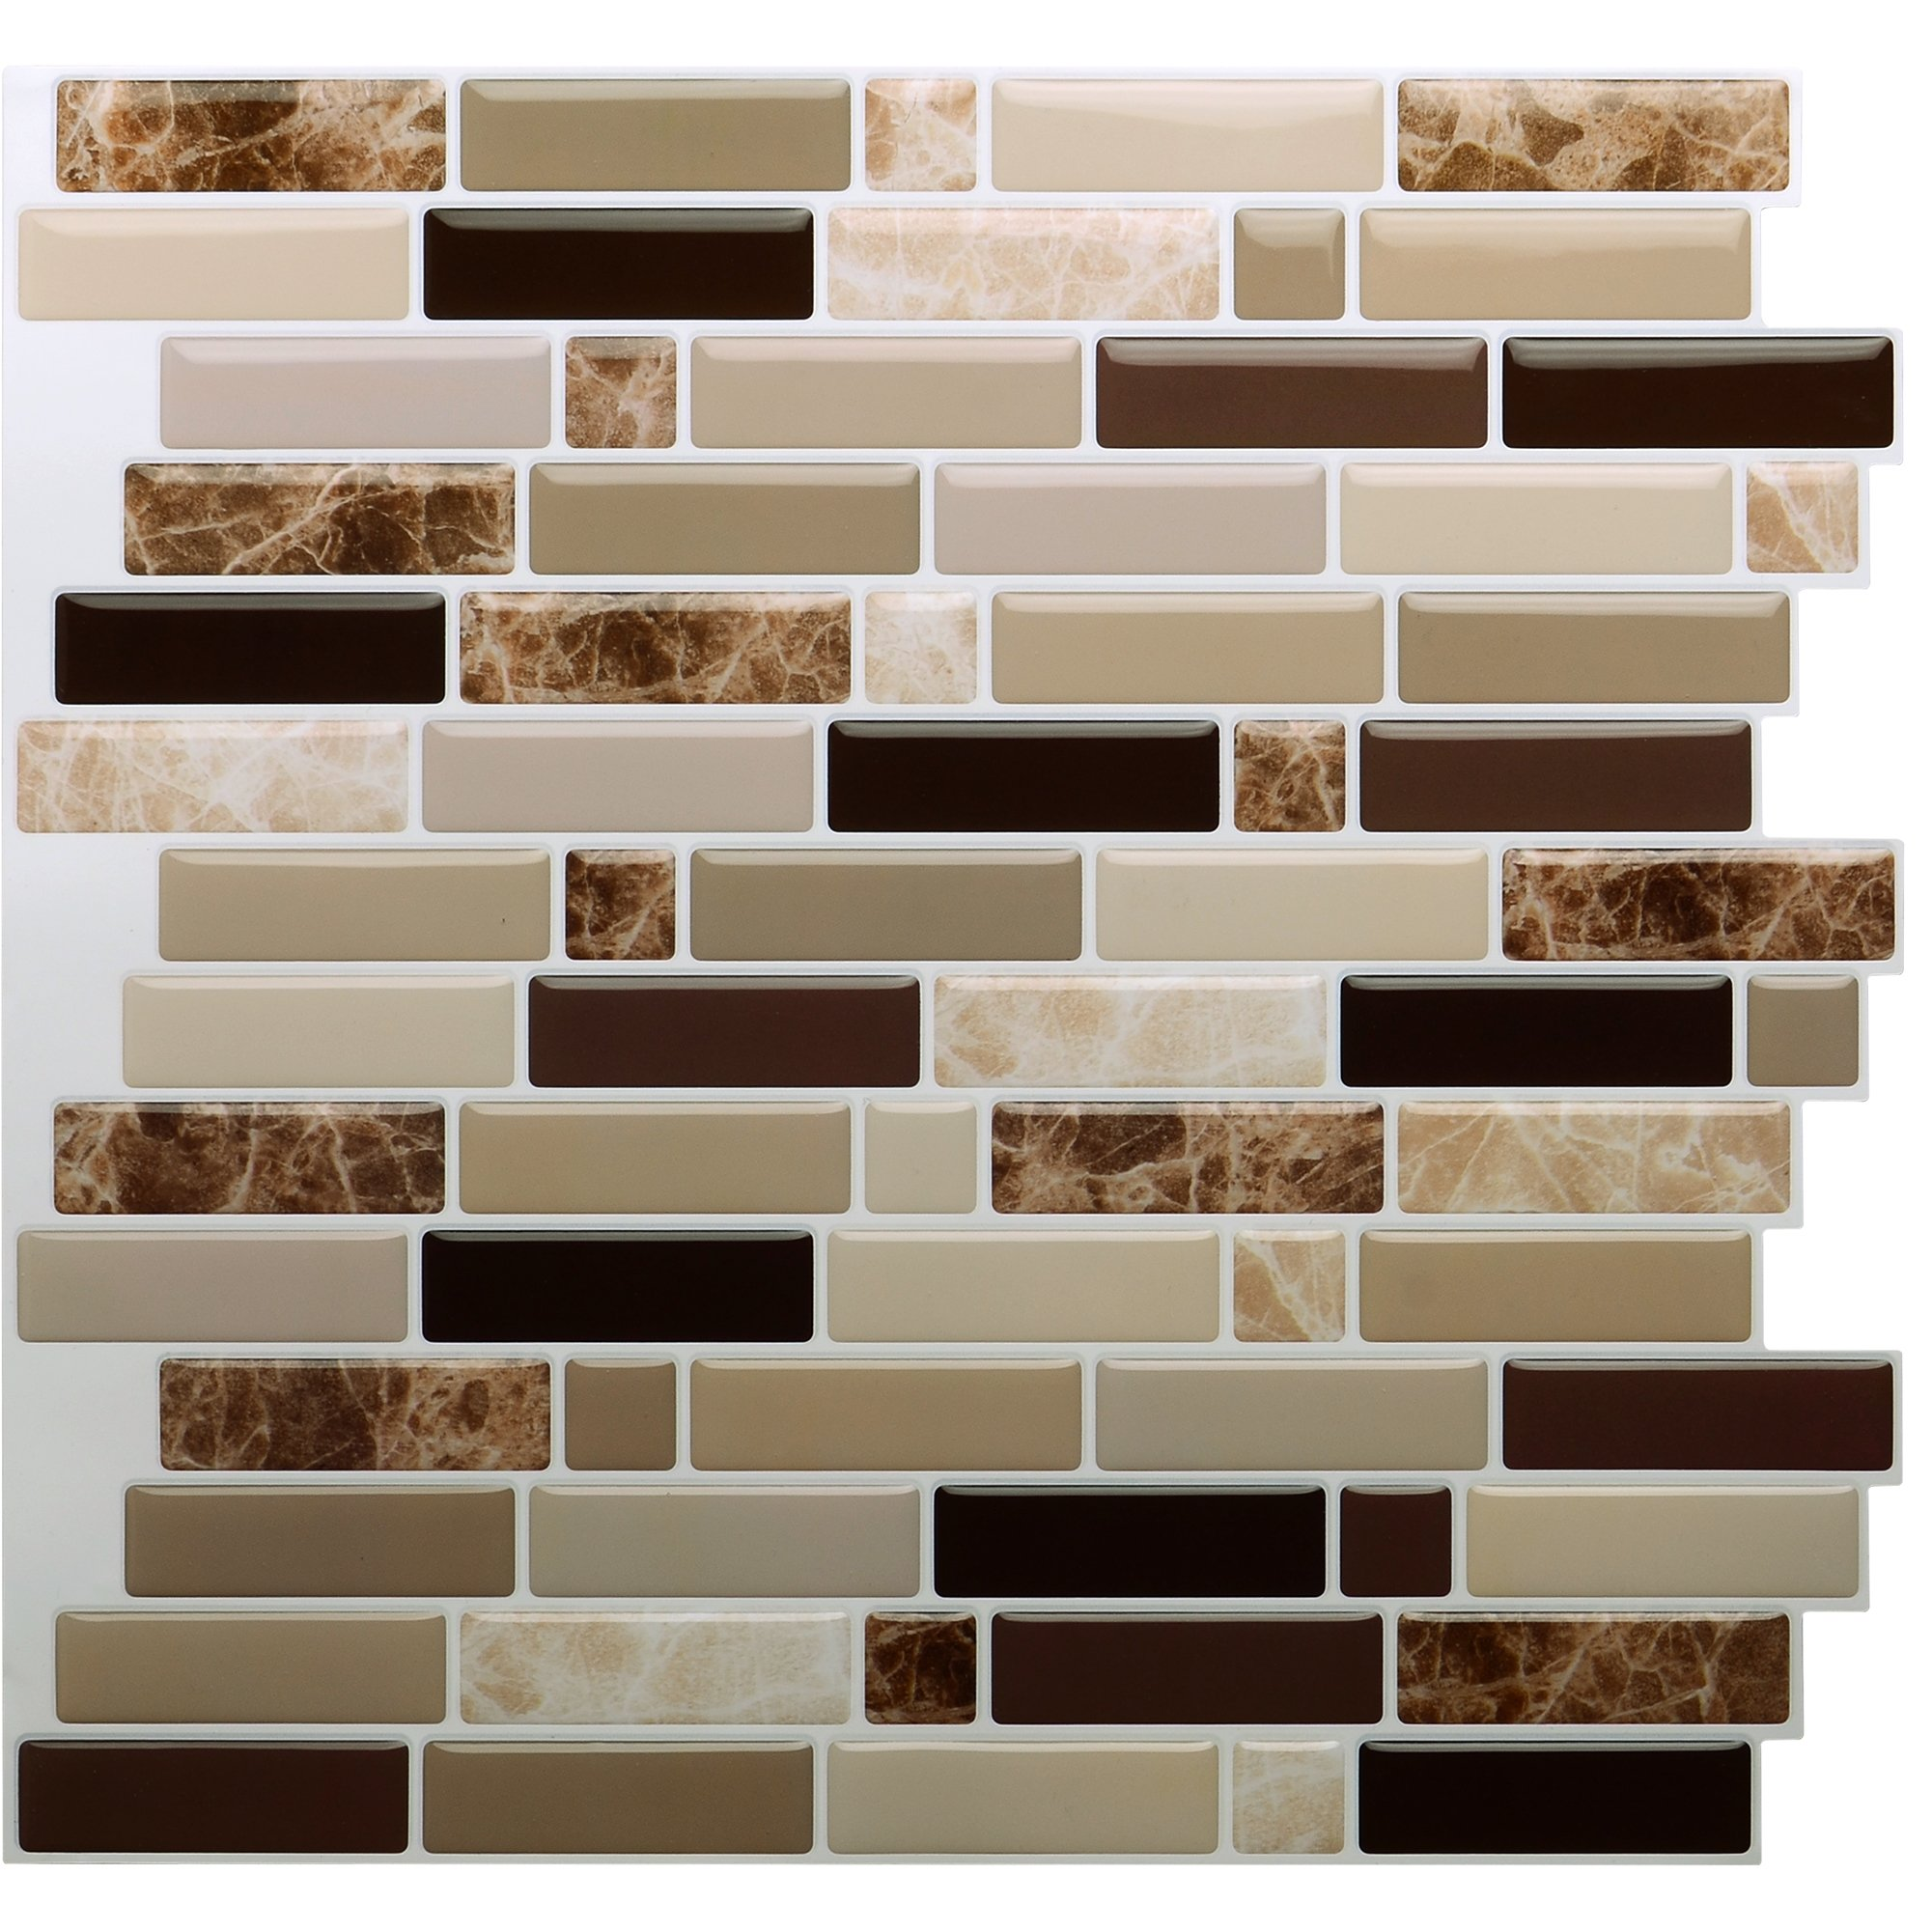 Cheap Adhesive Backsplash Tiles Find Adhesive Backsplash Tiles